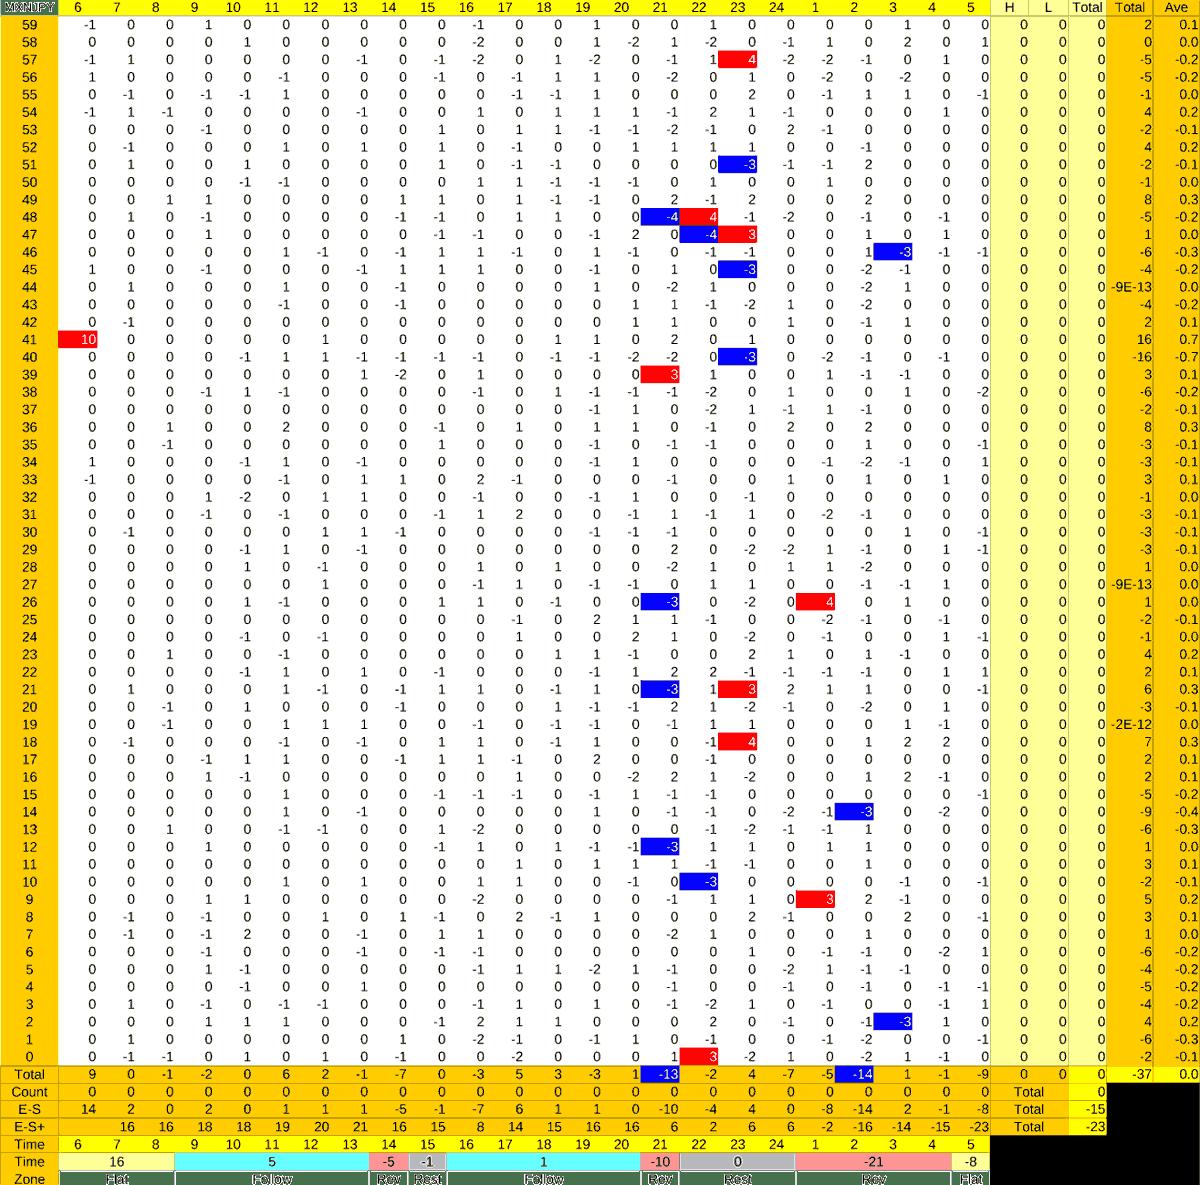 20210603_HS(3)MXNJPY